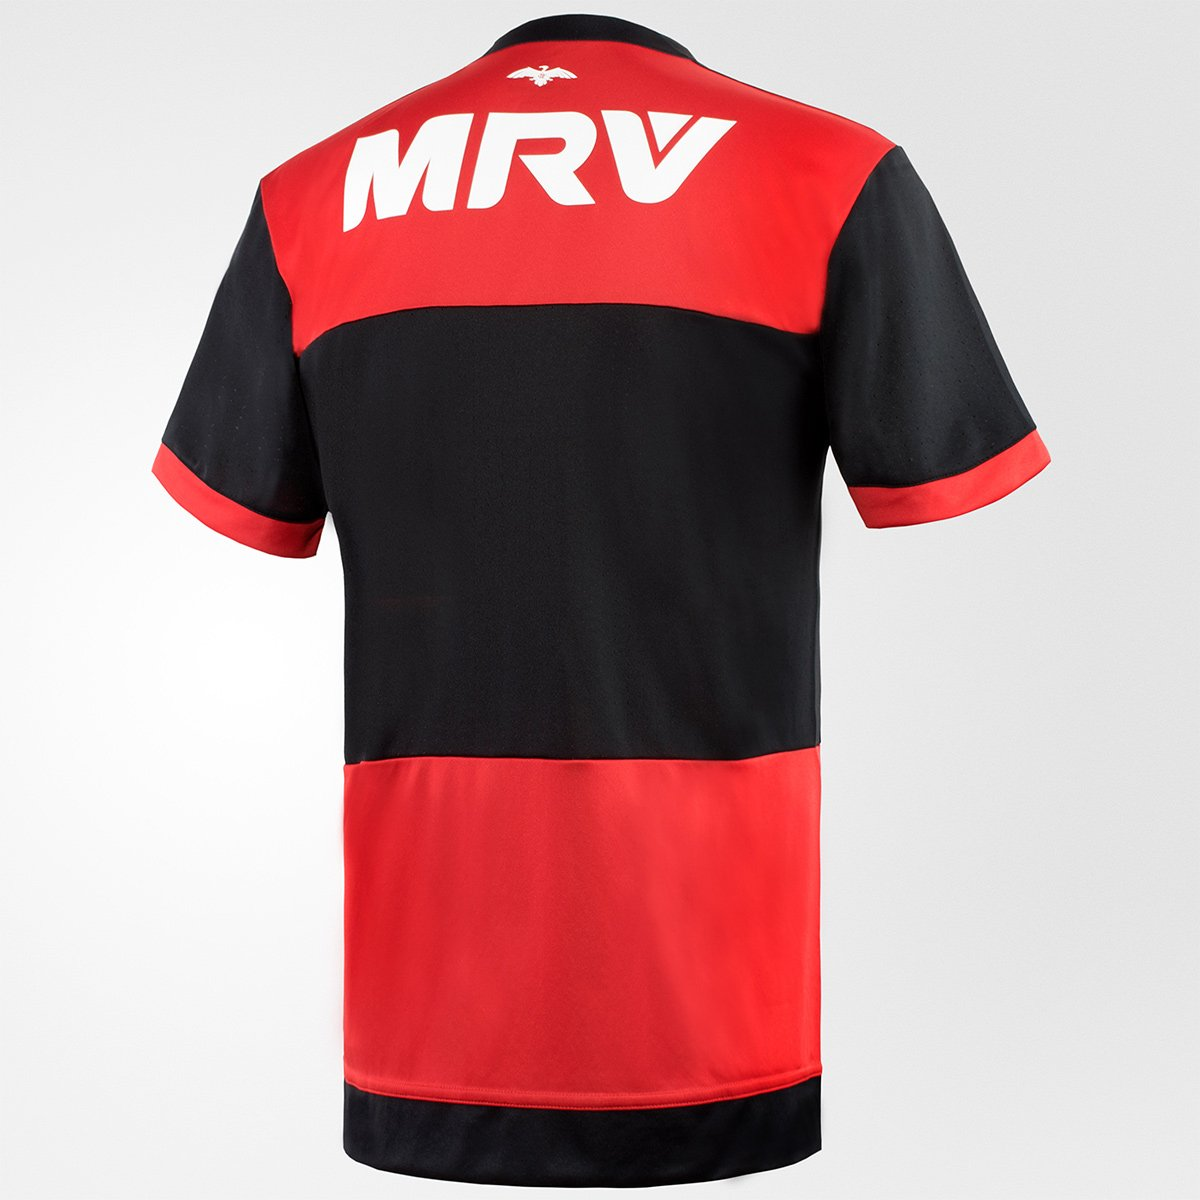 Camisa Flamengo I 17 18 s nº - Torcedor Adidas Masculina - Compre ... 11a2dd7be490b